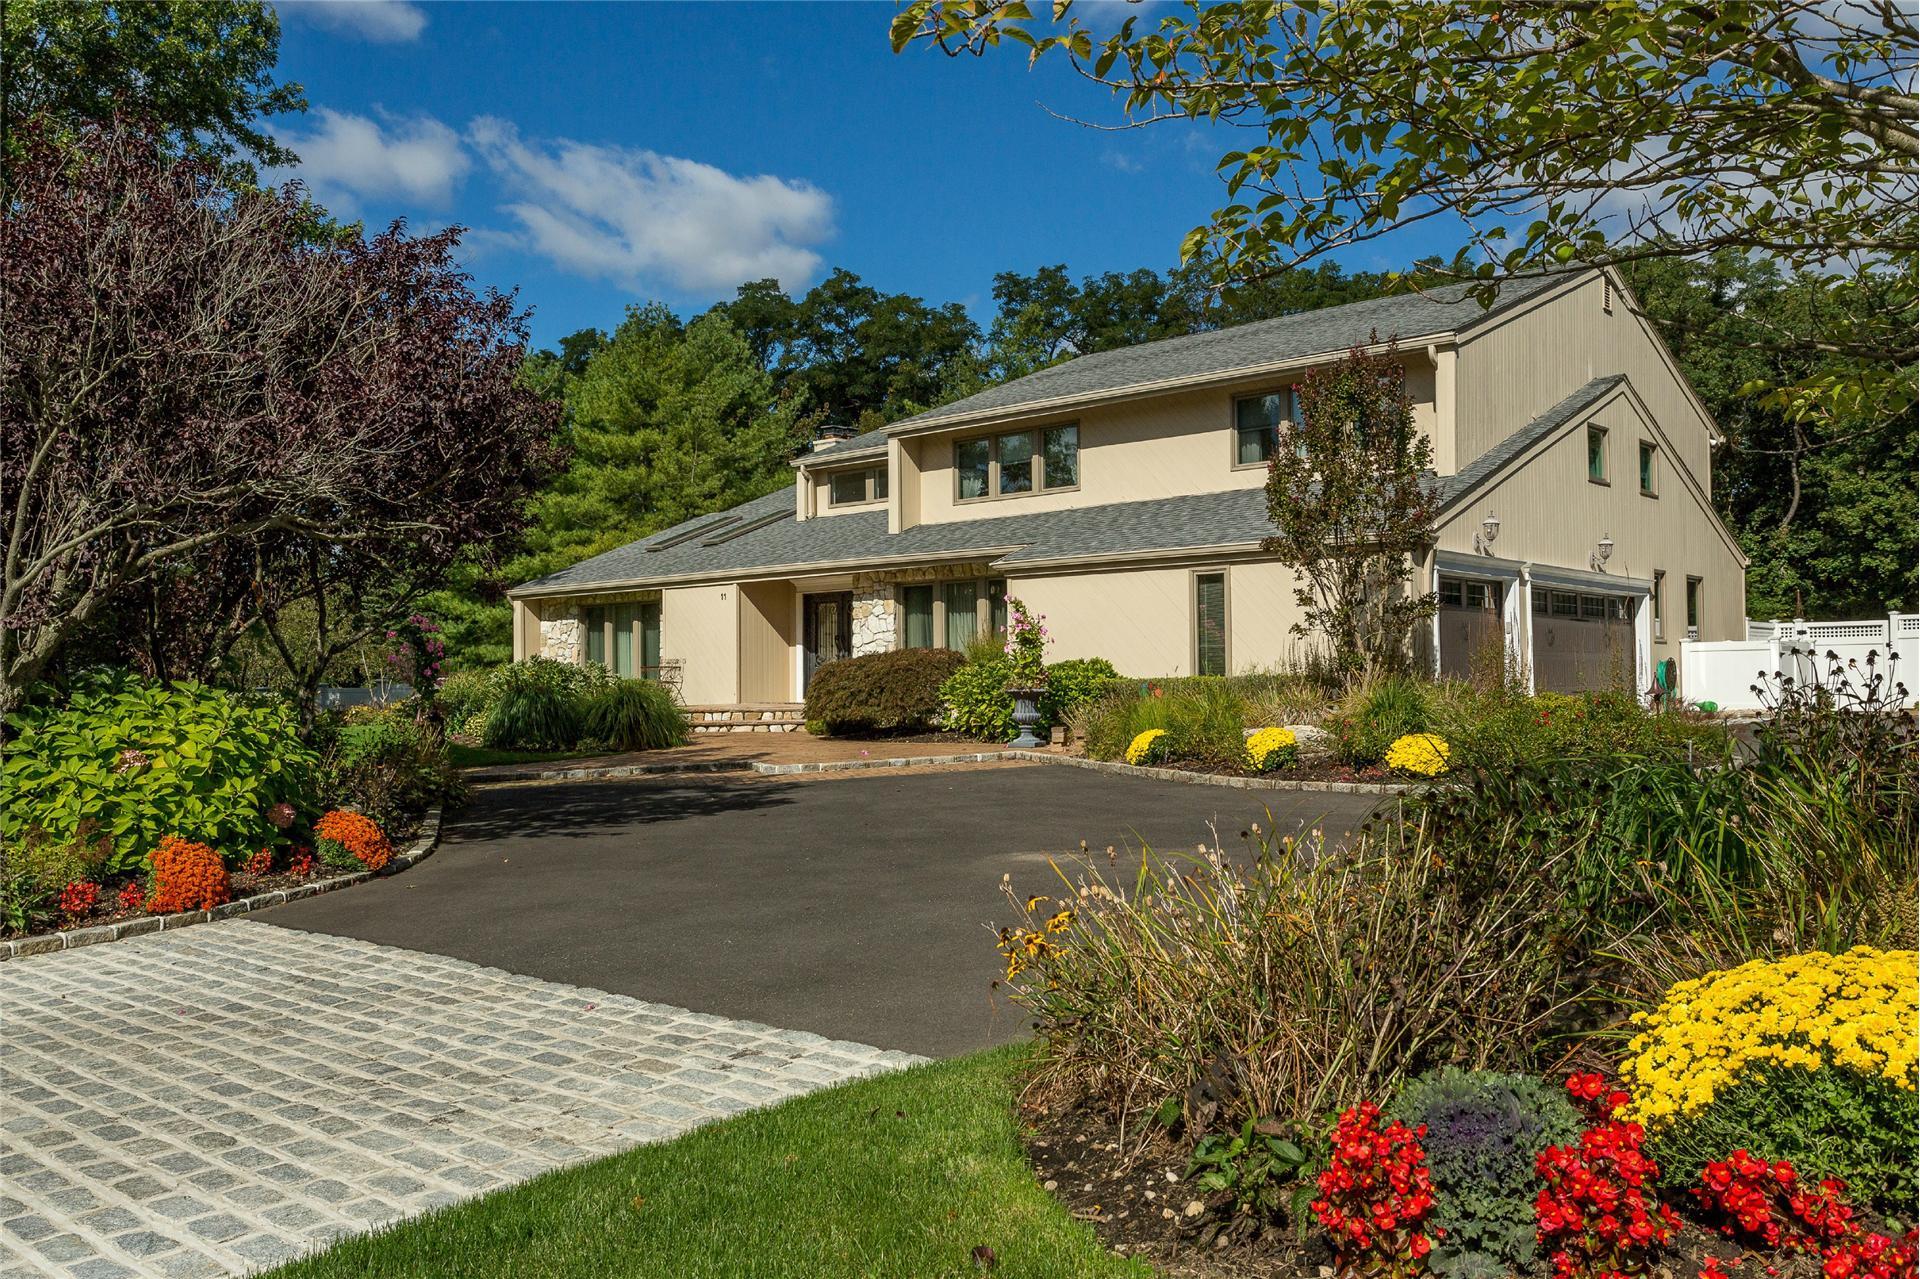 Single Family for Sale at 11 Phaetons Dr Melville, New York 11747 United States